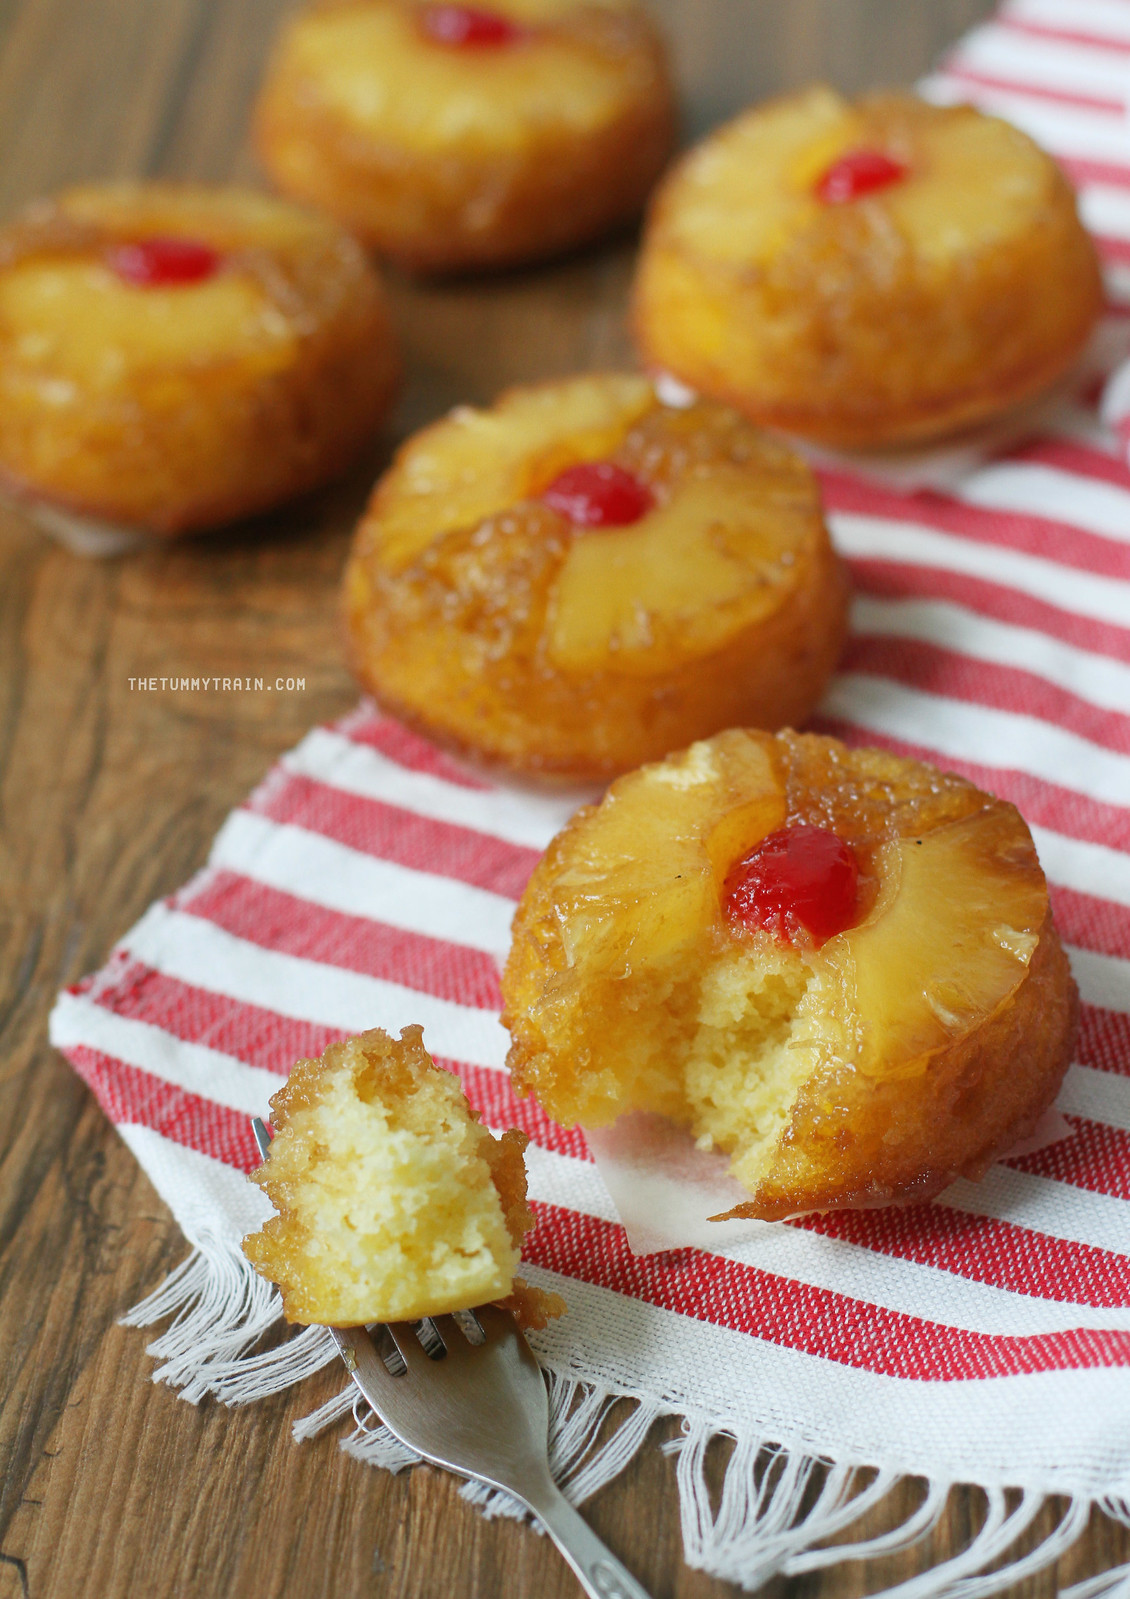 33893043382 babc0868da h - Taste Test: Maya Yellow Cake Mix Pineapple Upside Down Cake